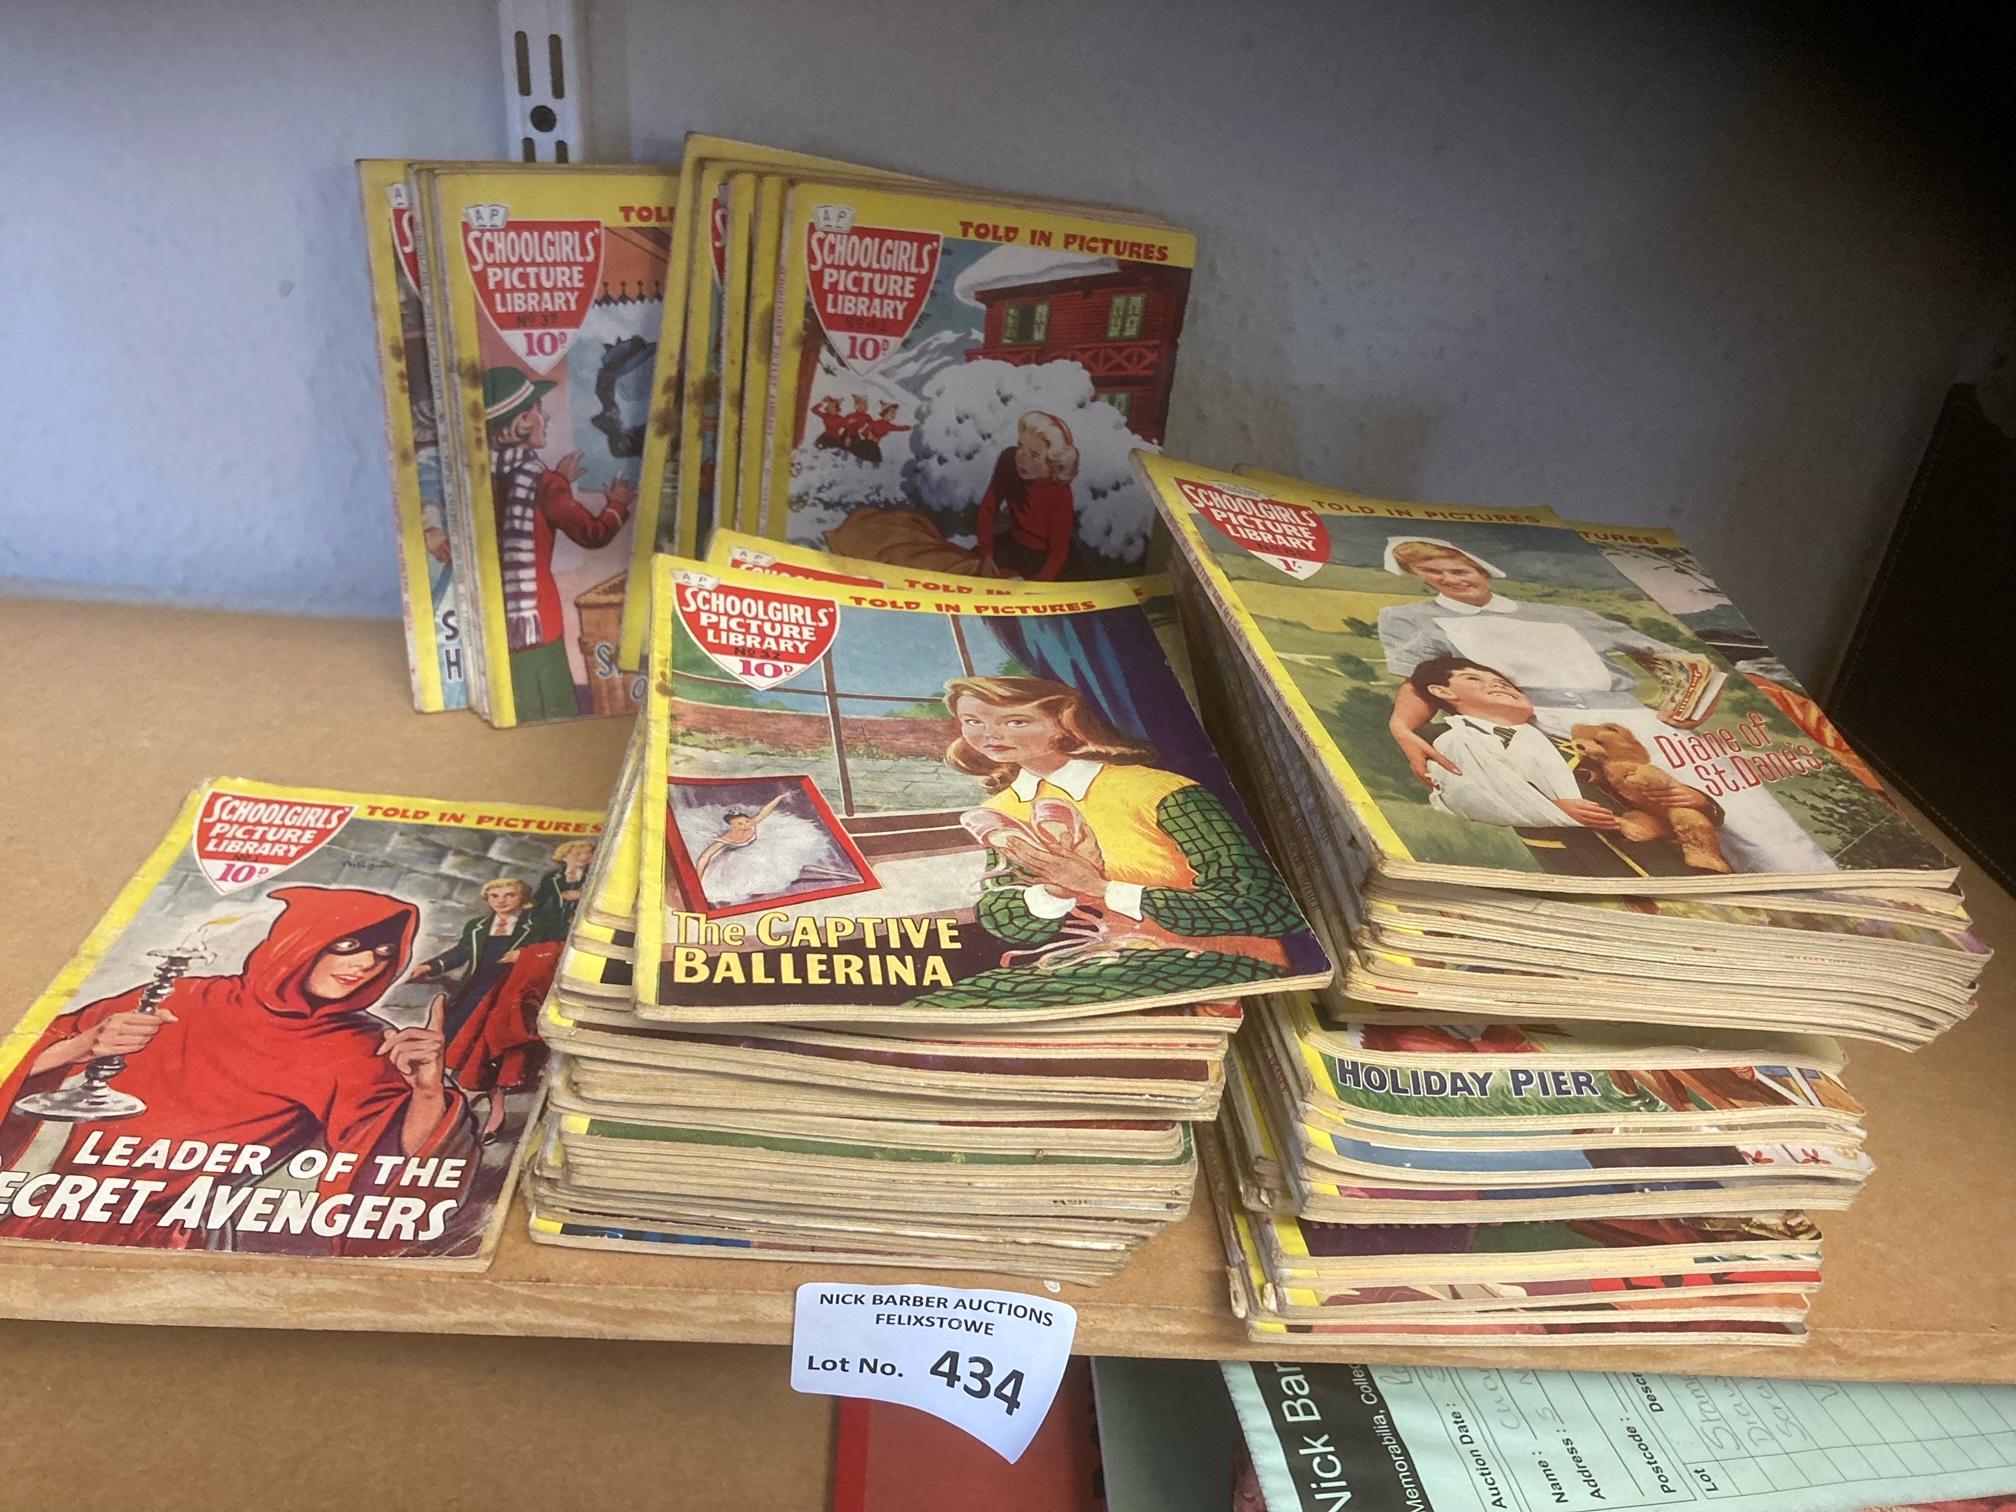 Comics : Schoolgirls Picture Library pocket size c